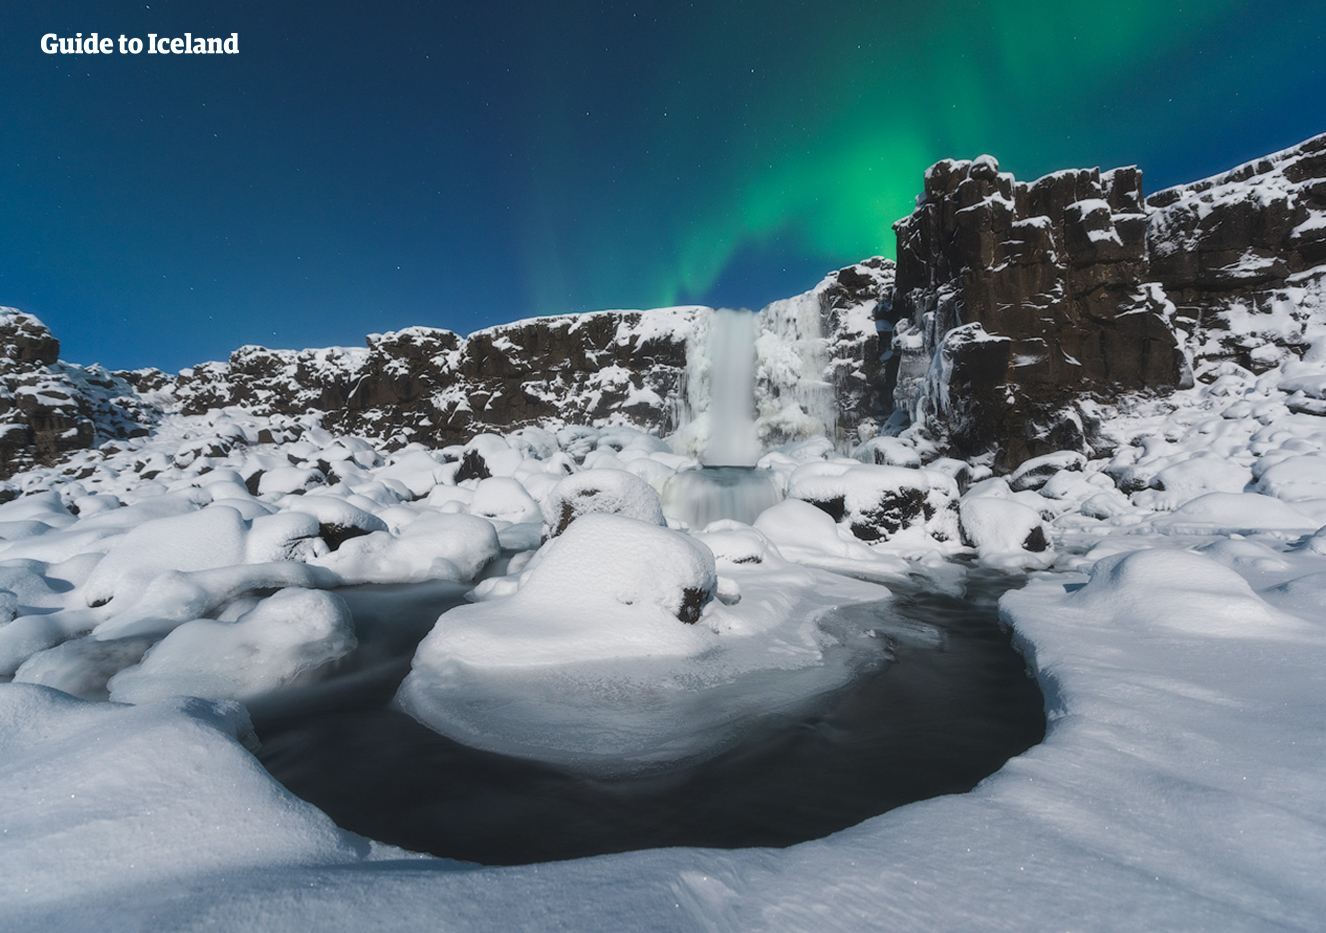 Cascata di Öxarárfoss nel parco nazionale di Thingvellir, durante l'inverno.